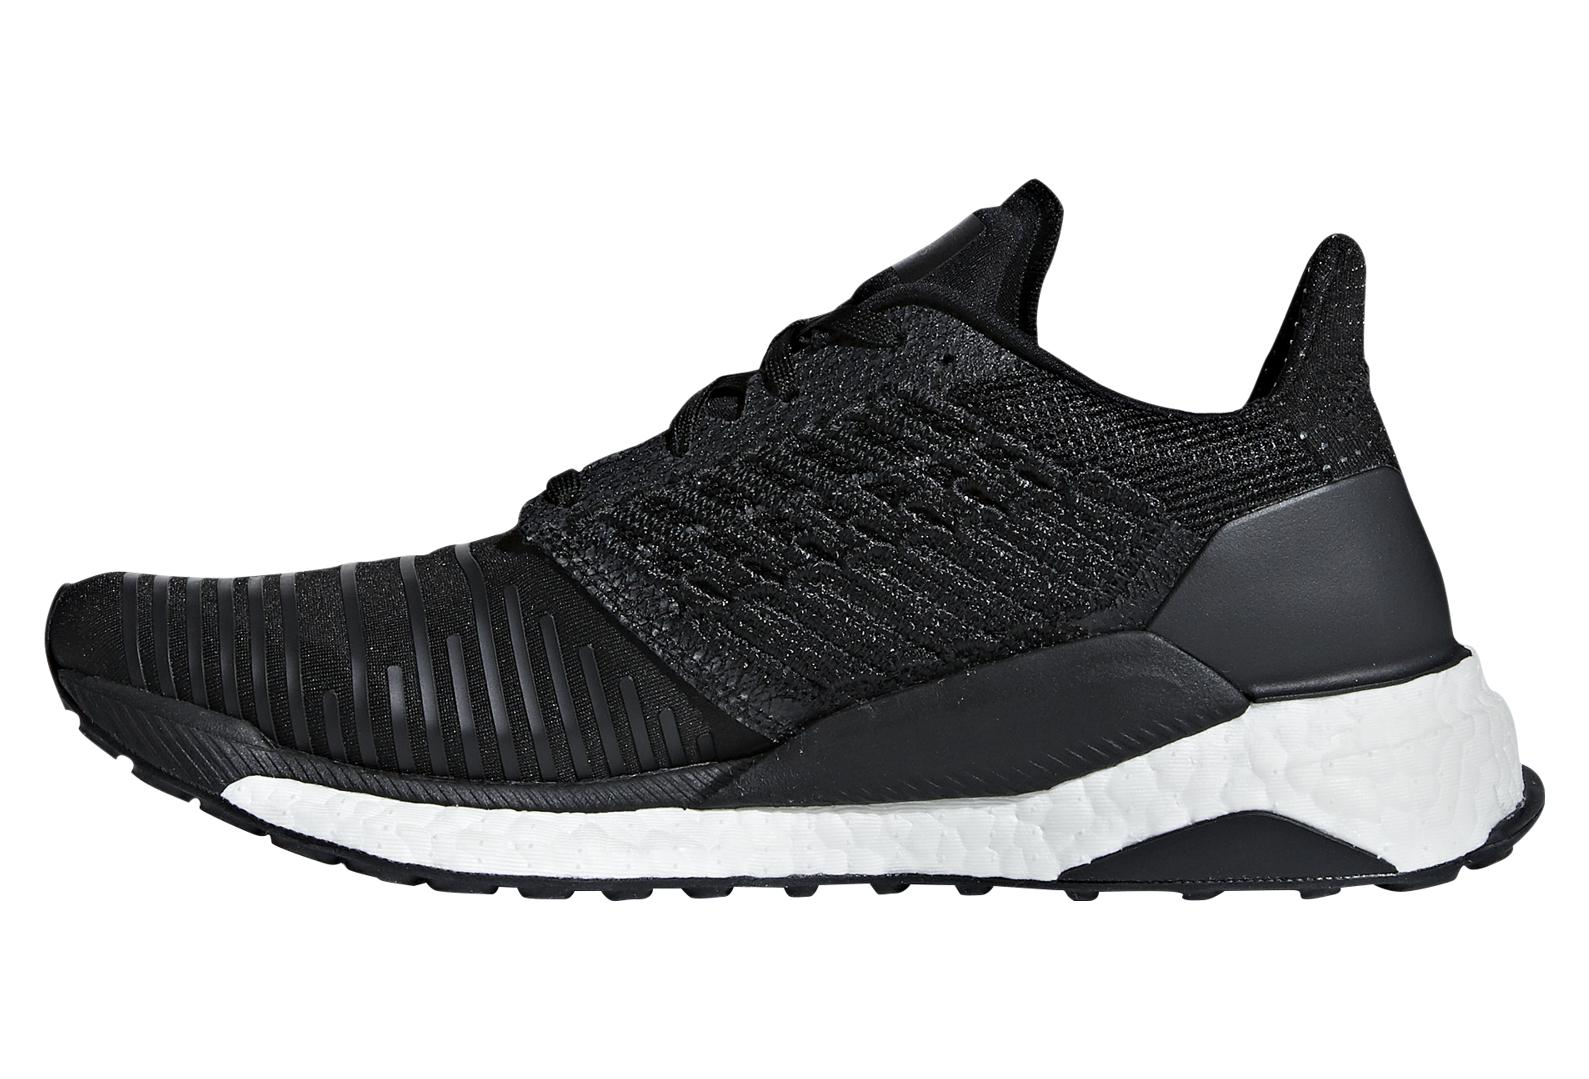 sale retailer ffaaa b2db5 Adidas SOLAR BOOST Women's Shoes Black